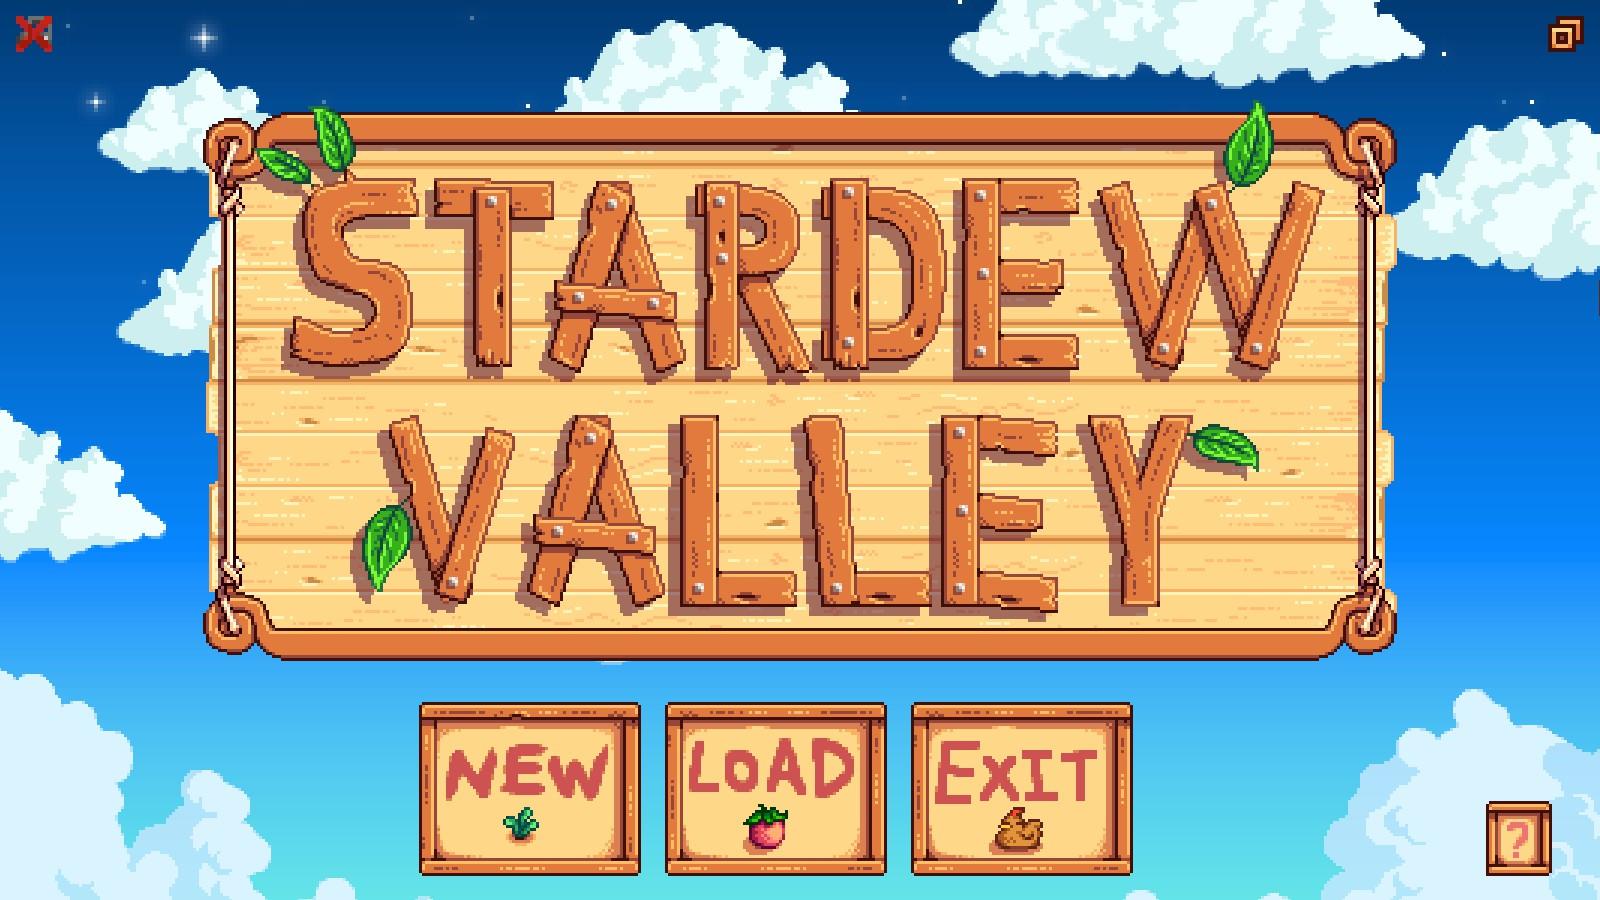 Stardew Valley. Mira abuelo! soy granjero!